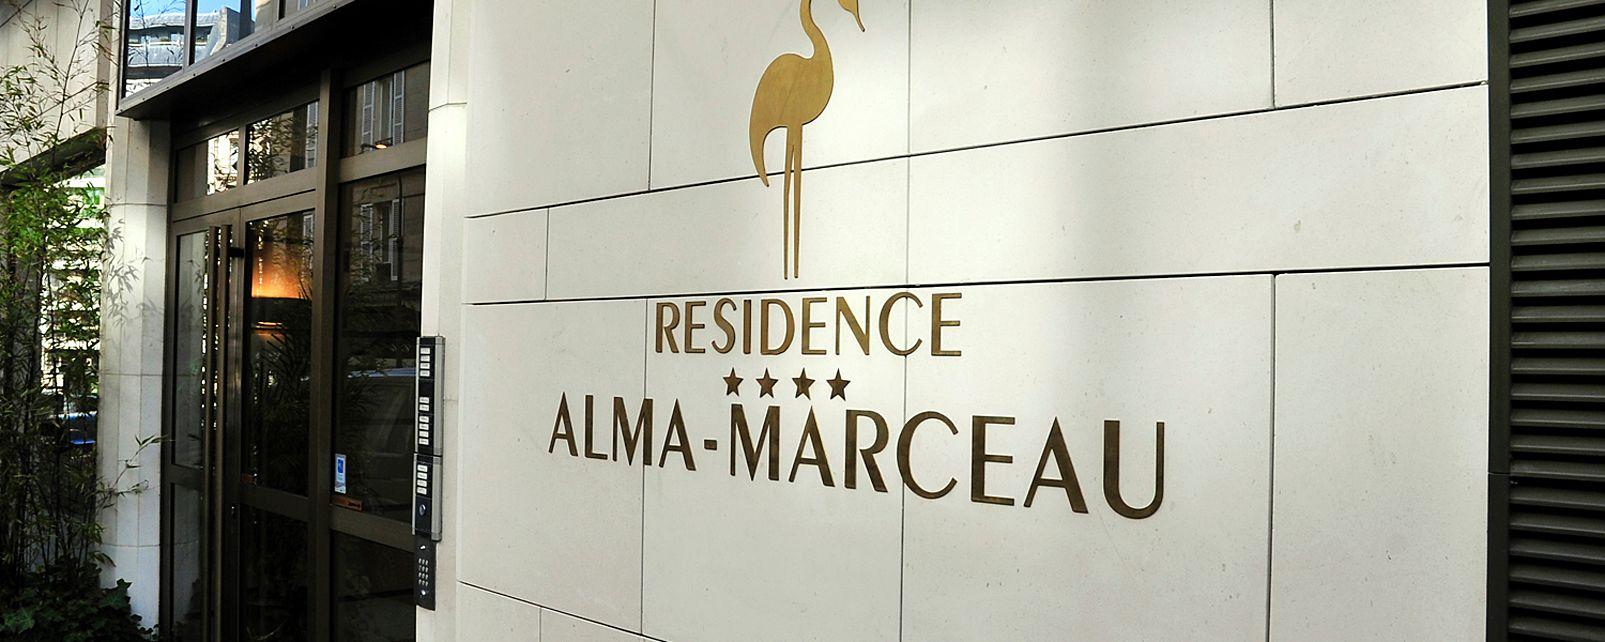 Hotel Residence Alma Marceau